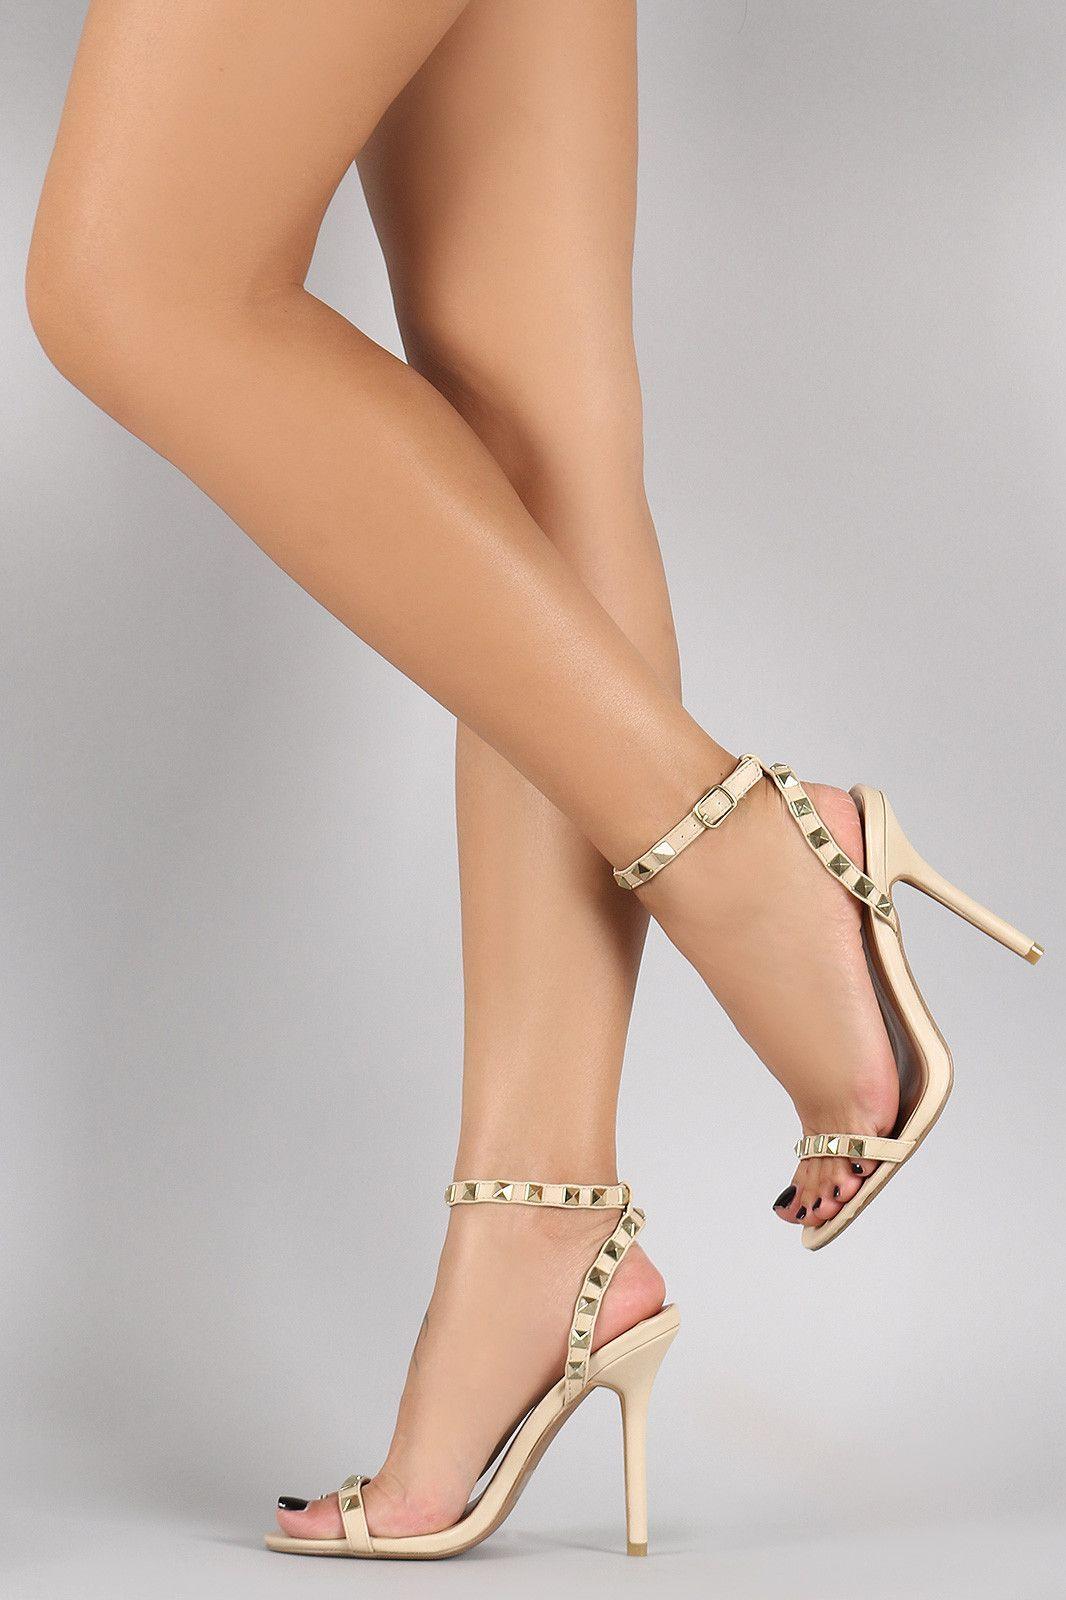 d851e6849480 Wild Diva Lounge Pyramid Stud Ankle Strap Stiletto Heel